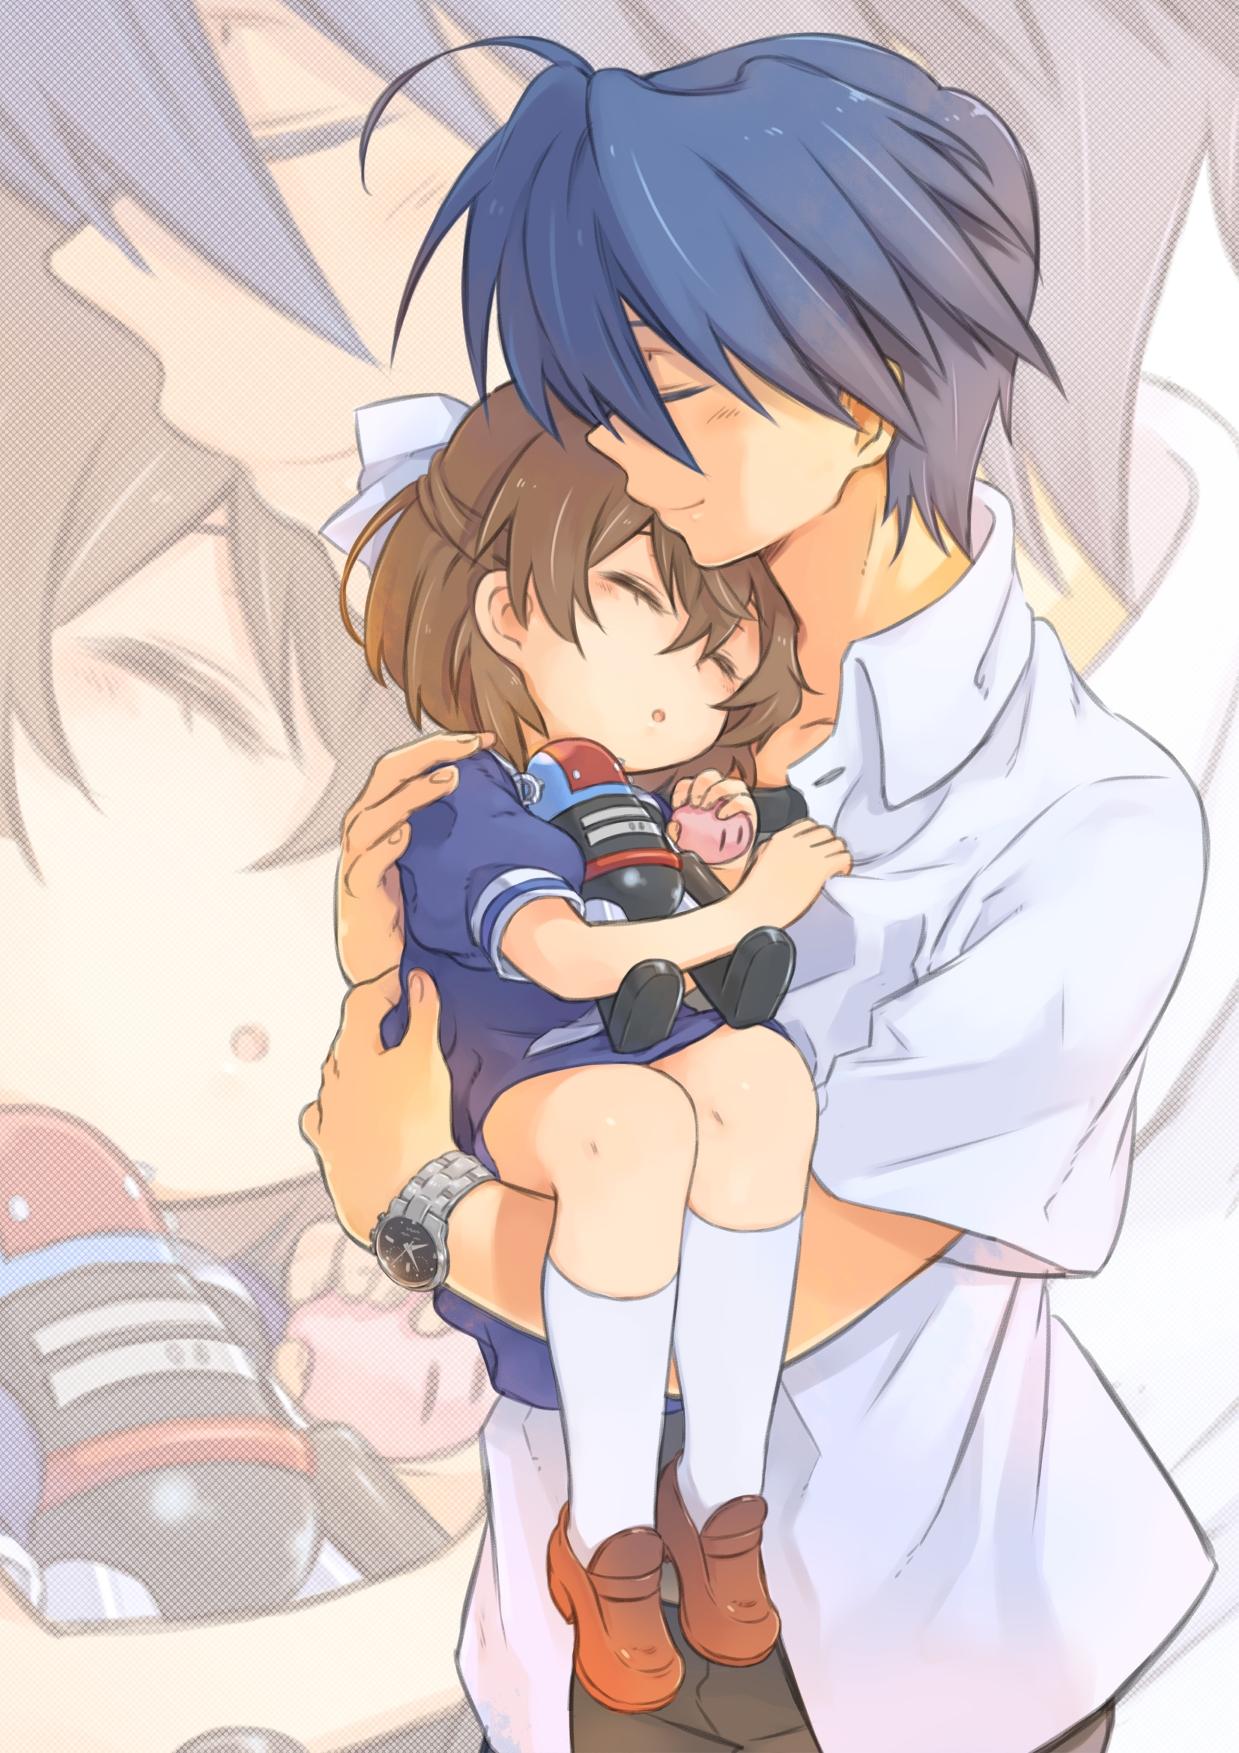 Father Daughter Hugging - Cumception